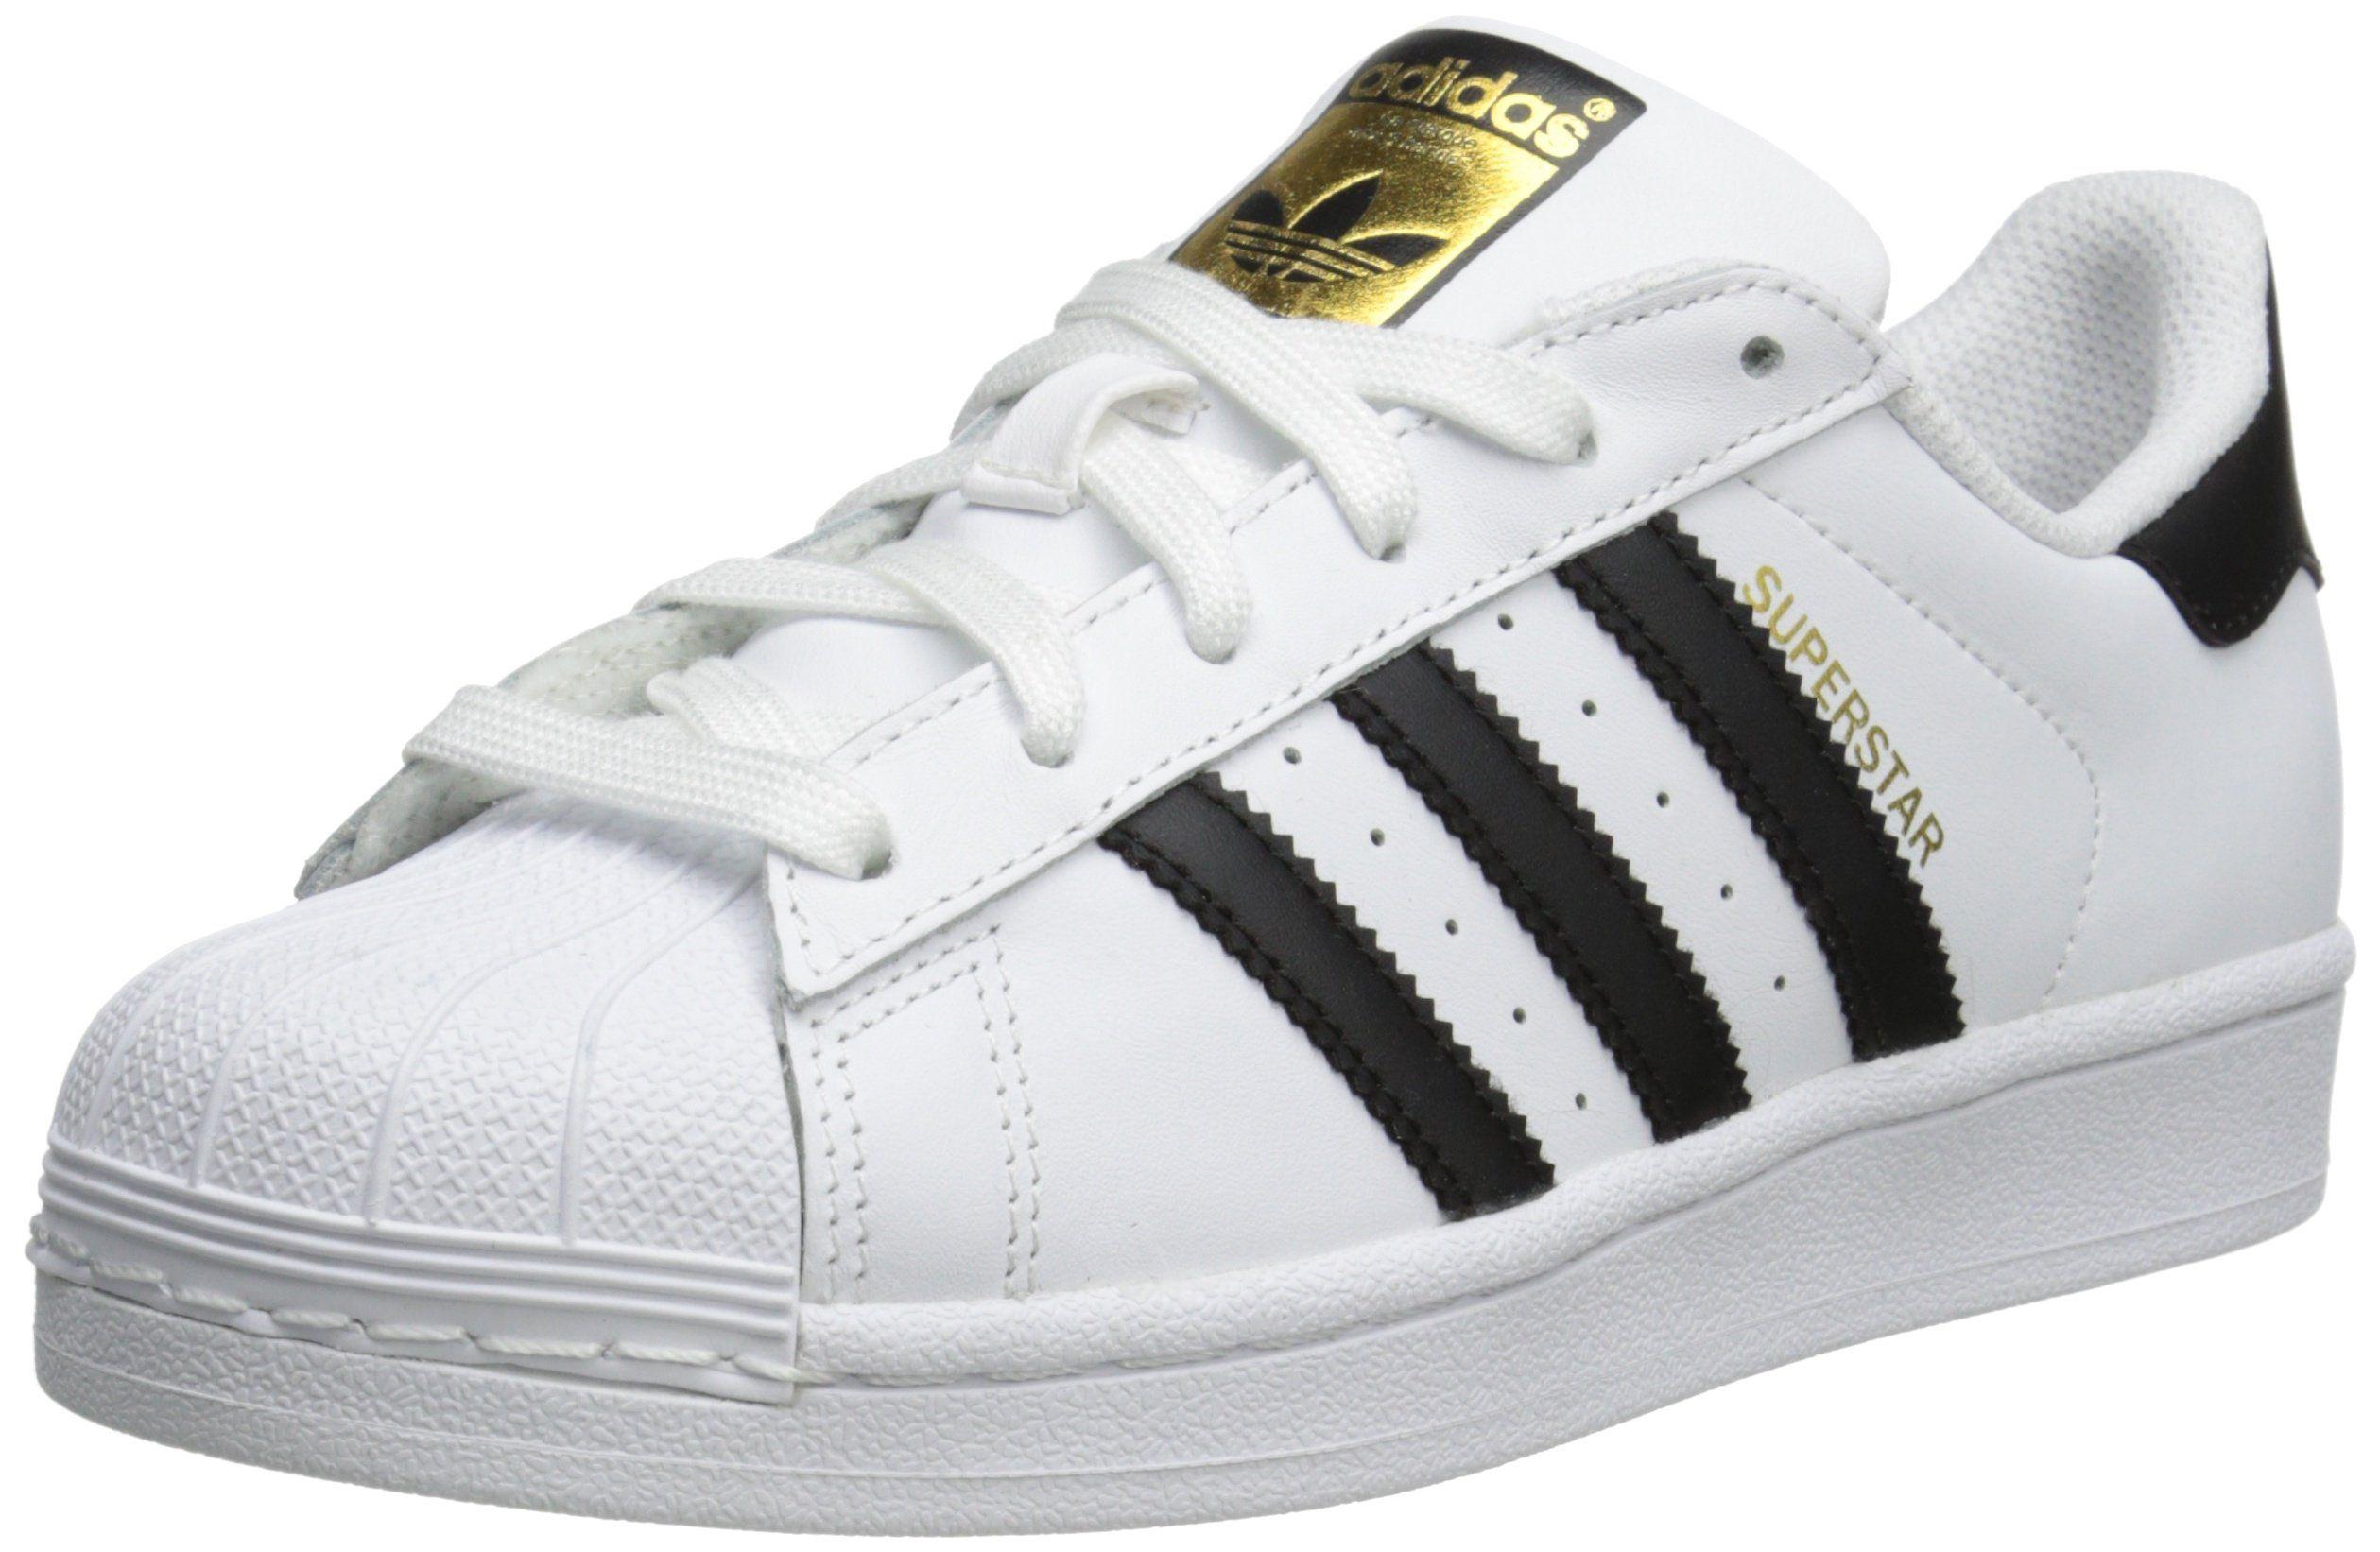 Low Originals Cut Superstar Casual Adidas J Basketball Sneakerbig FTlK1Jc3u